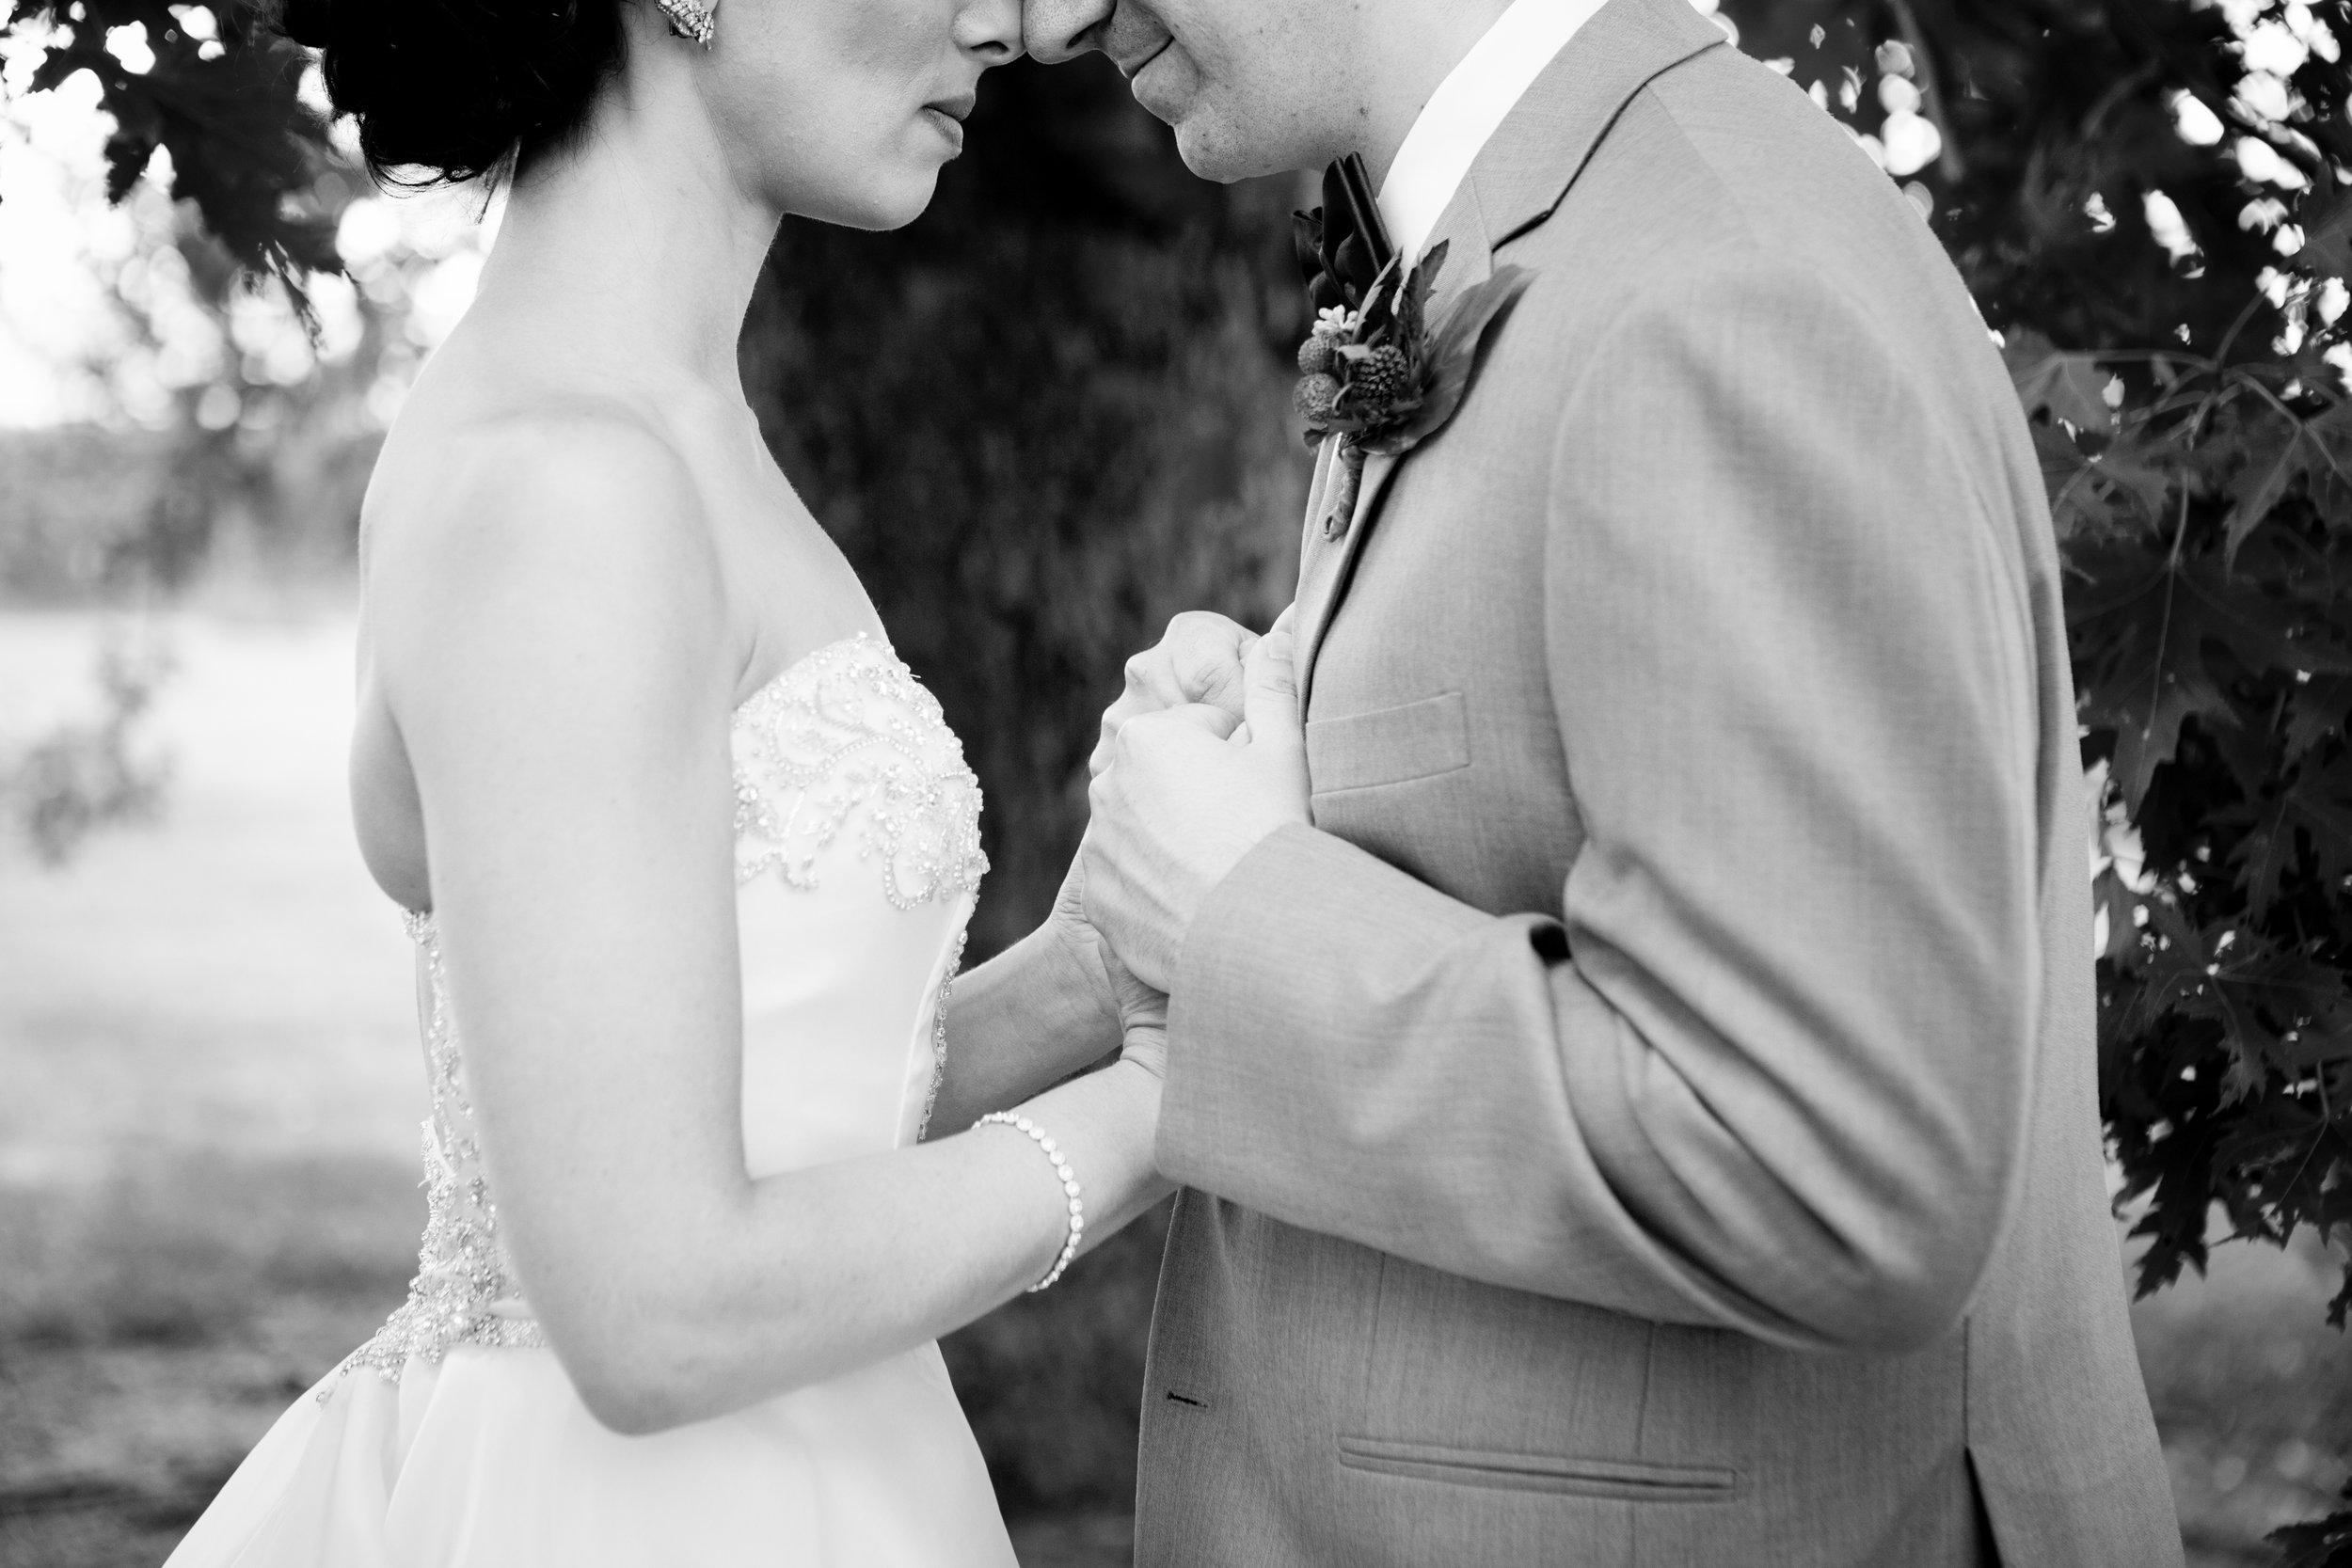 ca_080517_wedding_0179.jpg